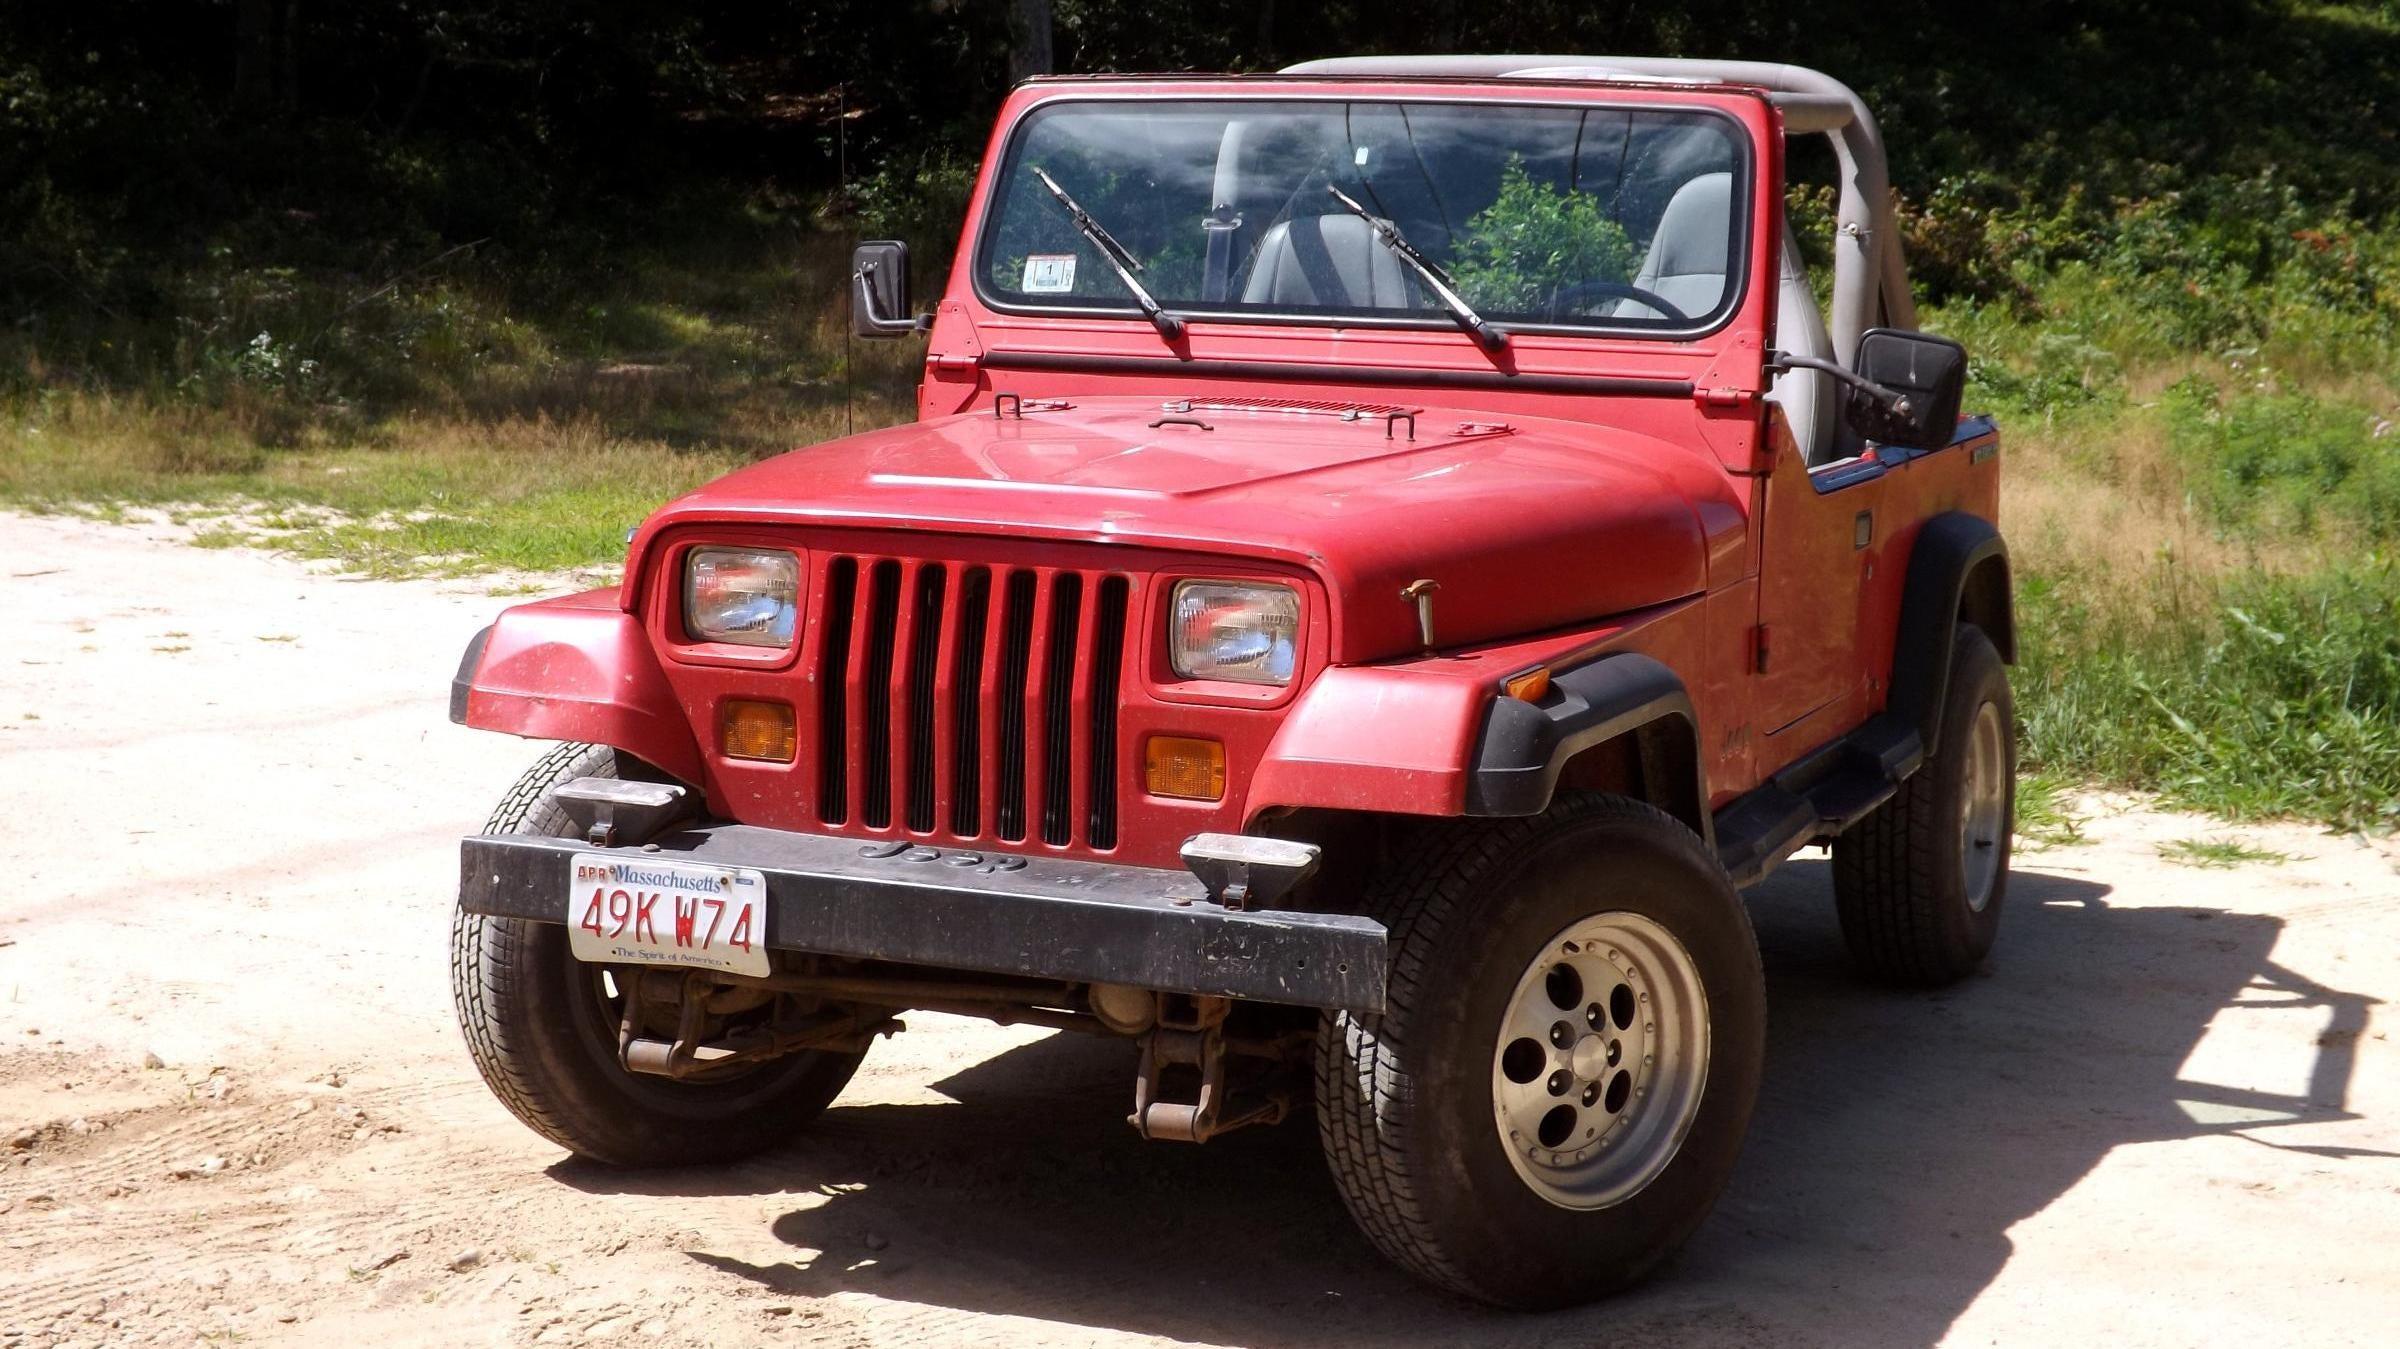 1990 jeep wrangler the oppositelock review. Black Bedroom Furniture Sets. Home Design Ideas